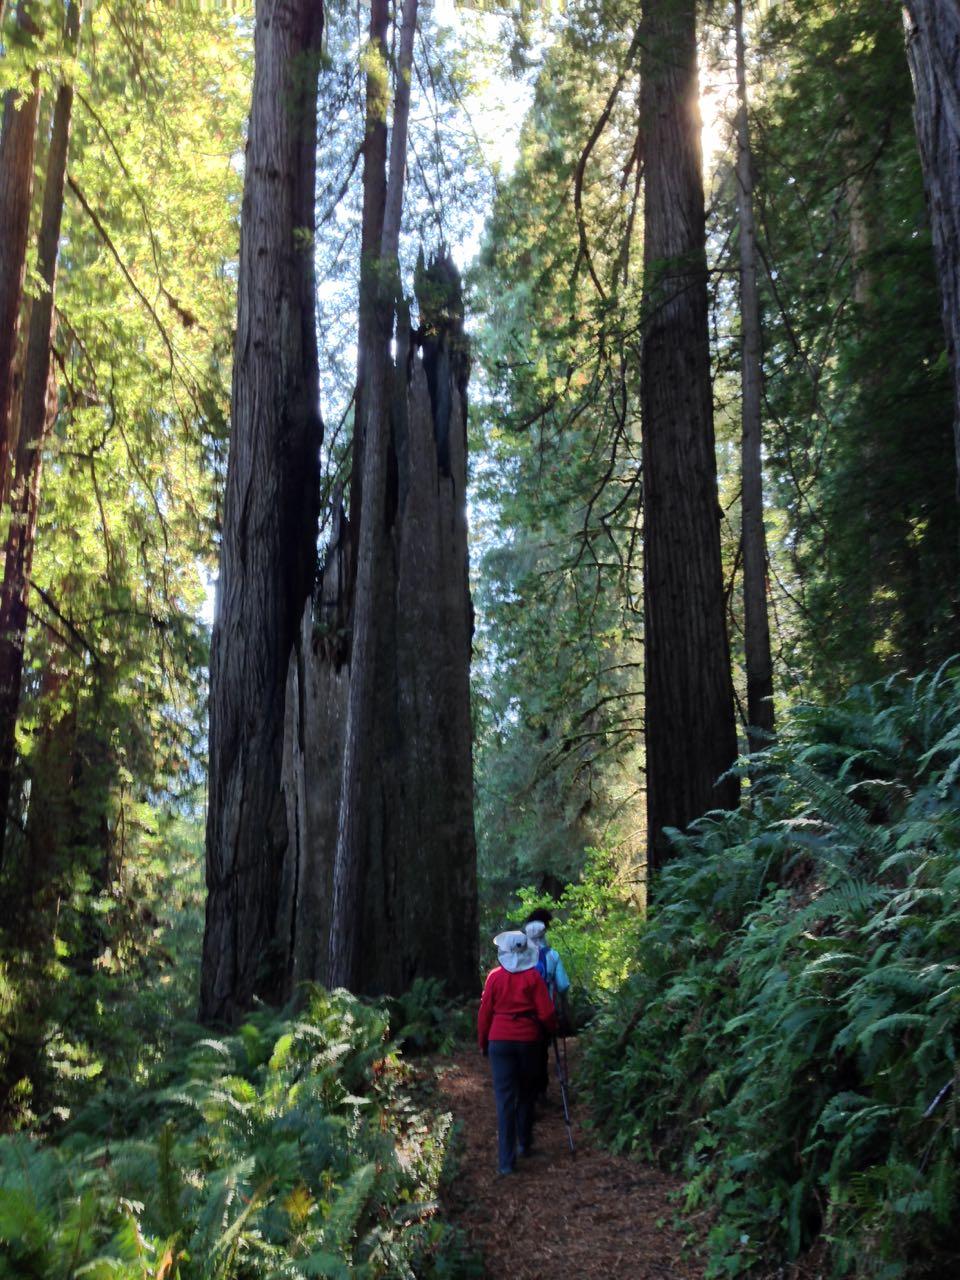 Redwoods 2017 10 01 219 Of 244